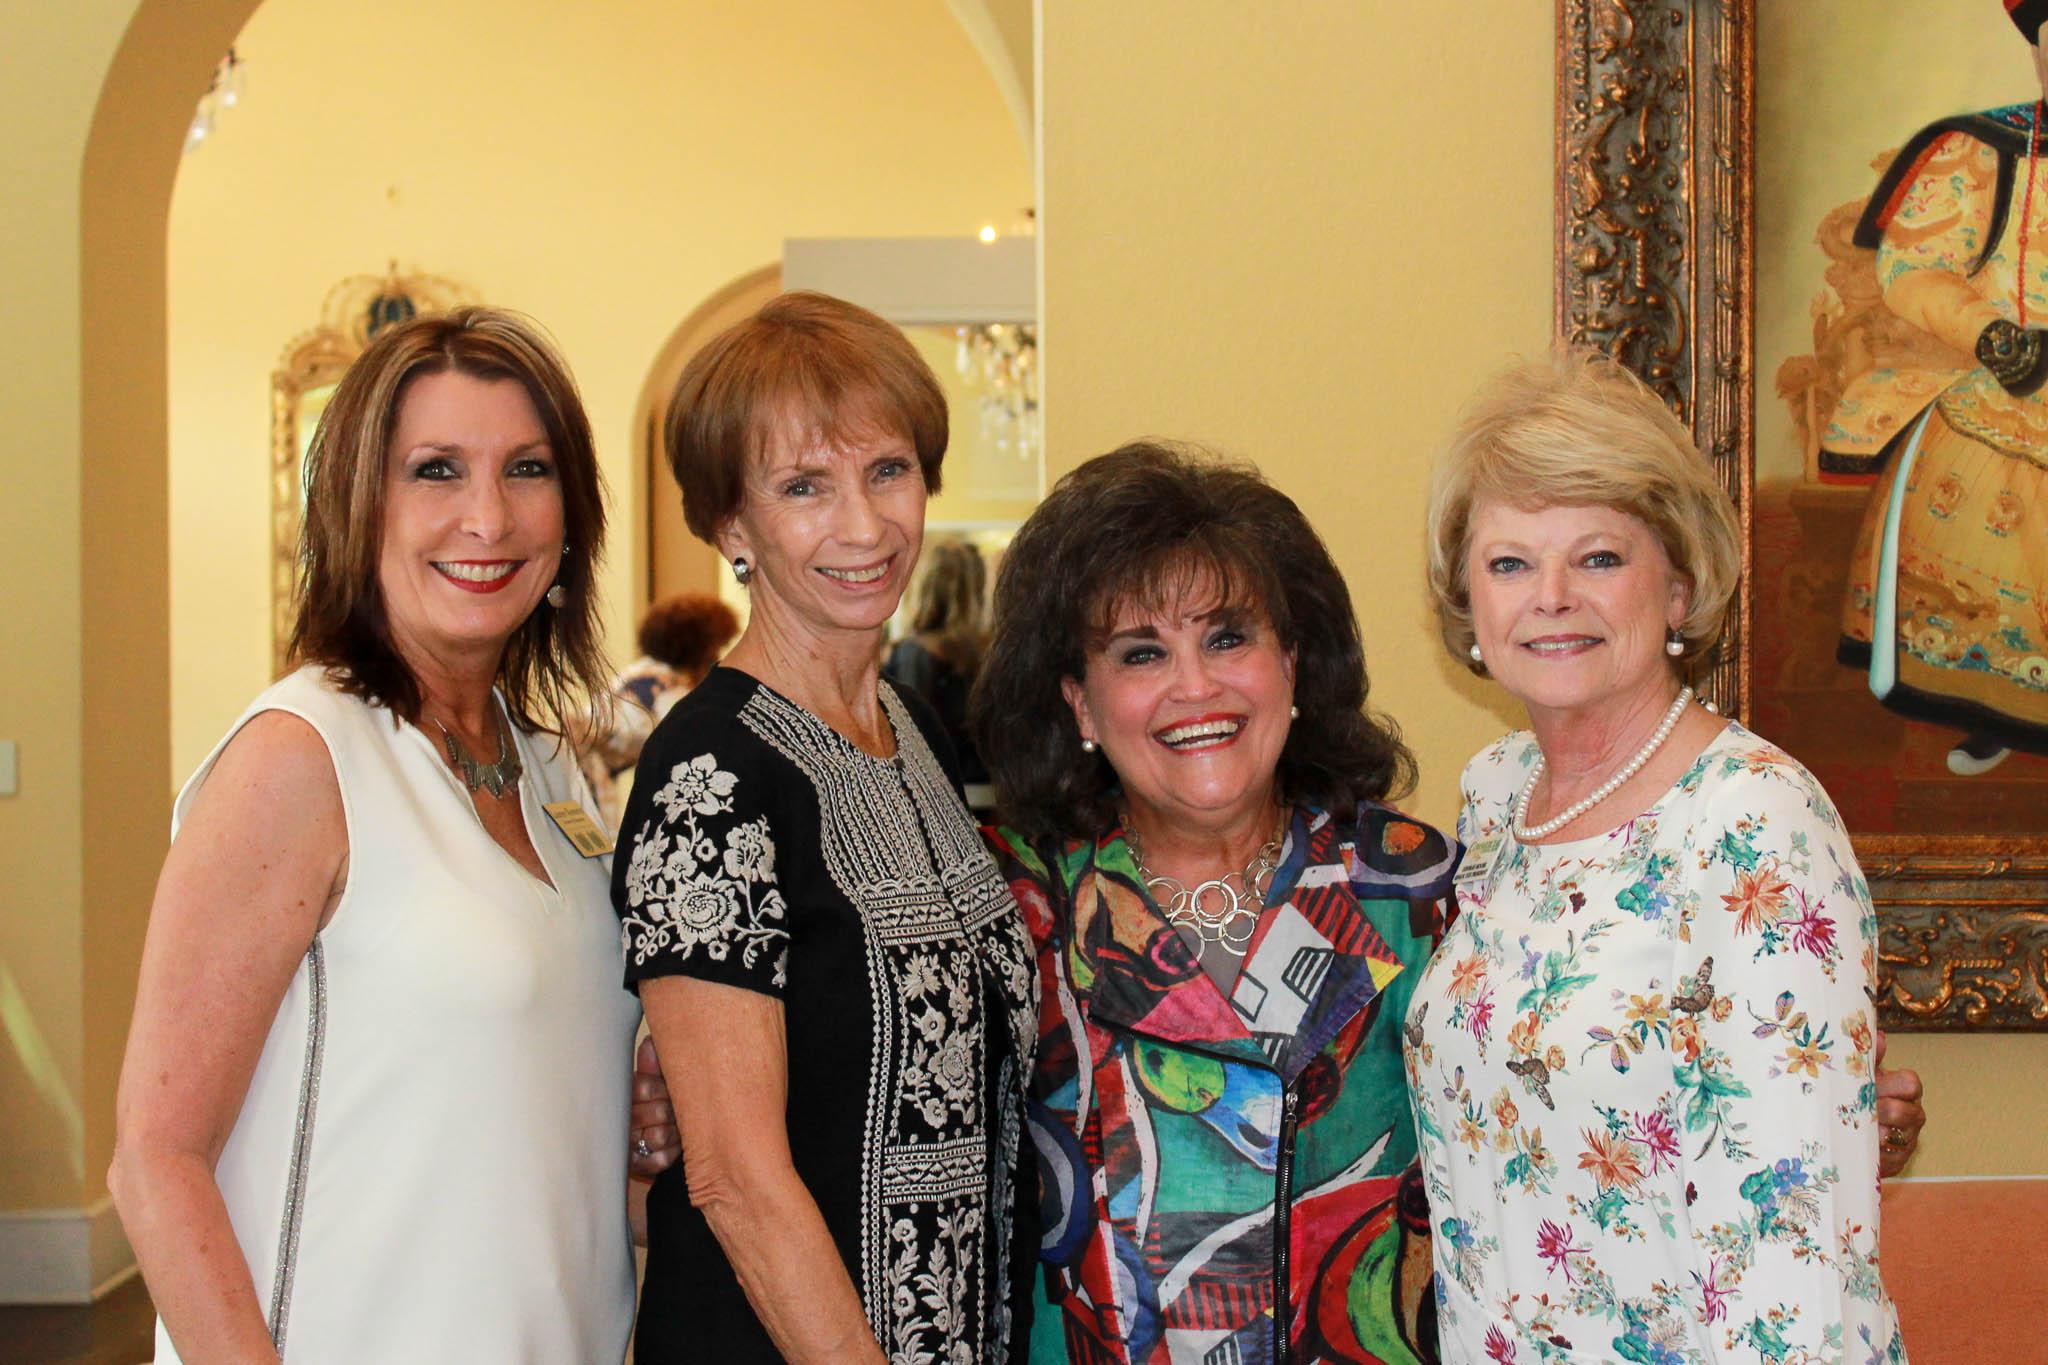 Lauree Romero, Diann Roy, Mary Katherine Weber and Debra Moore